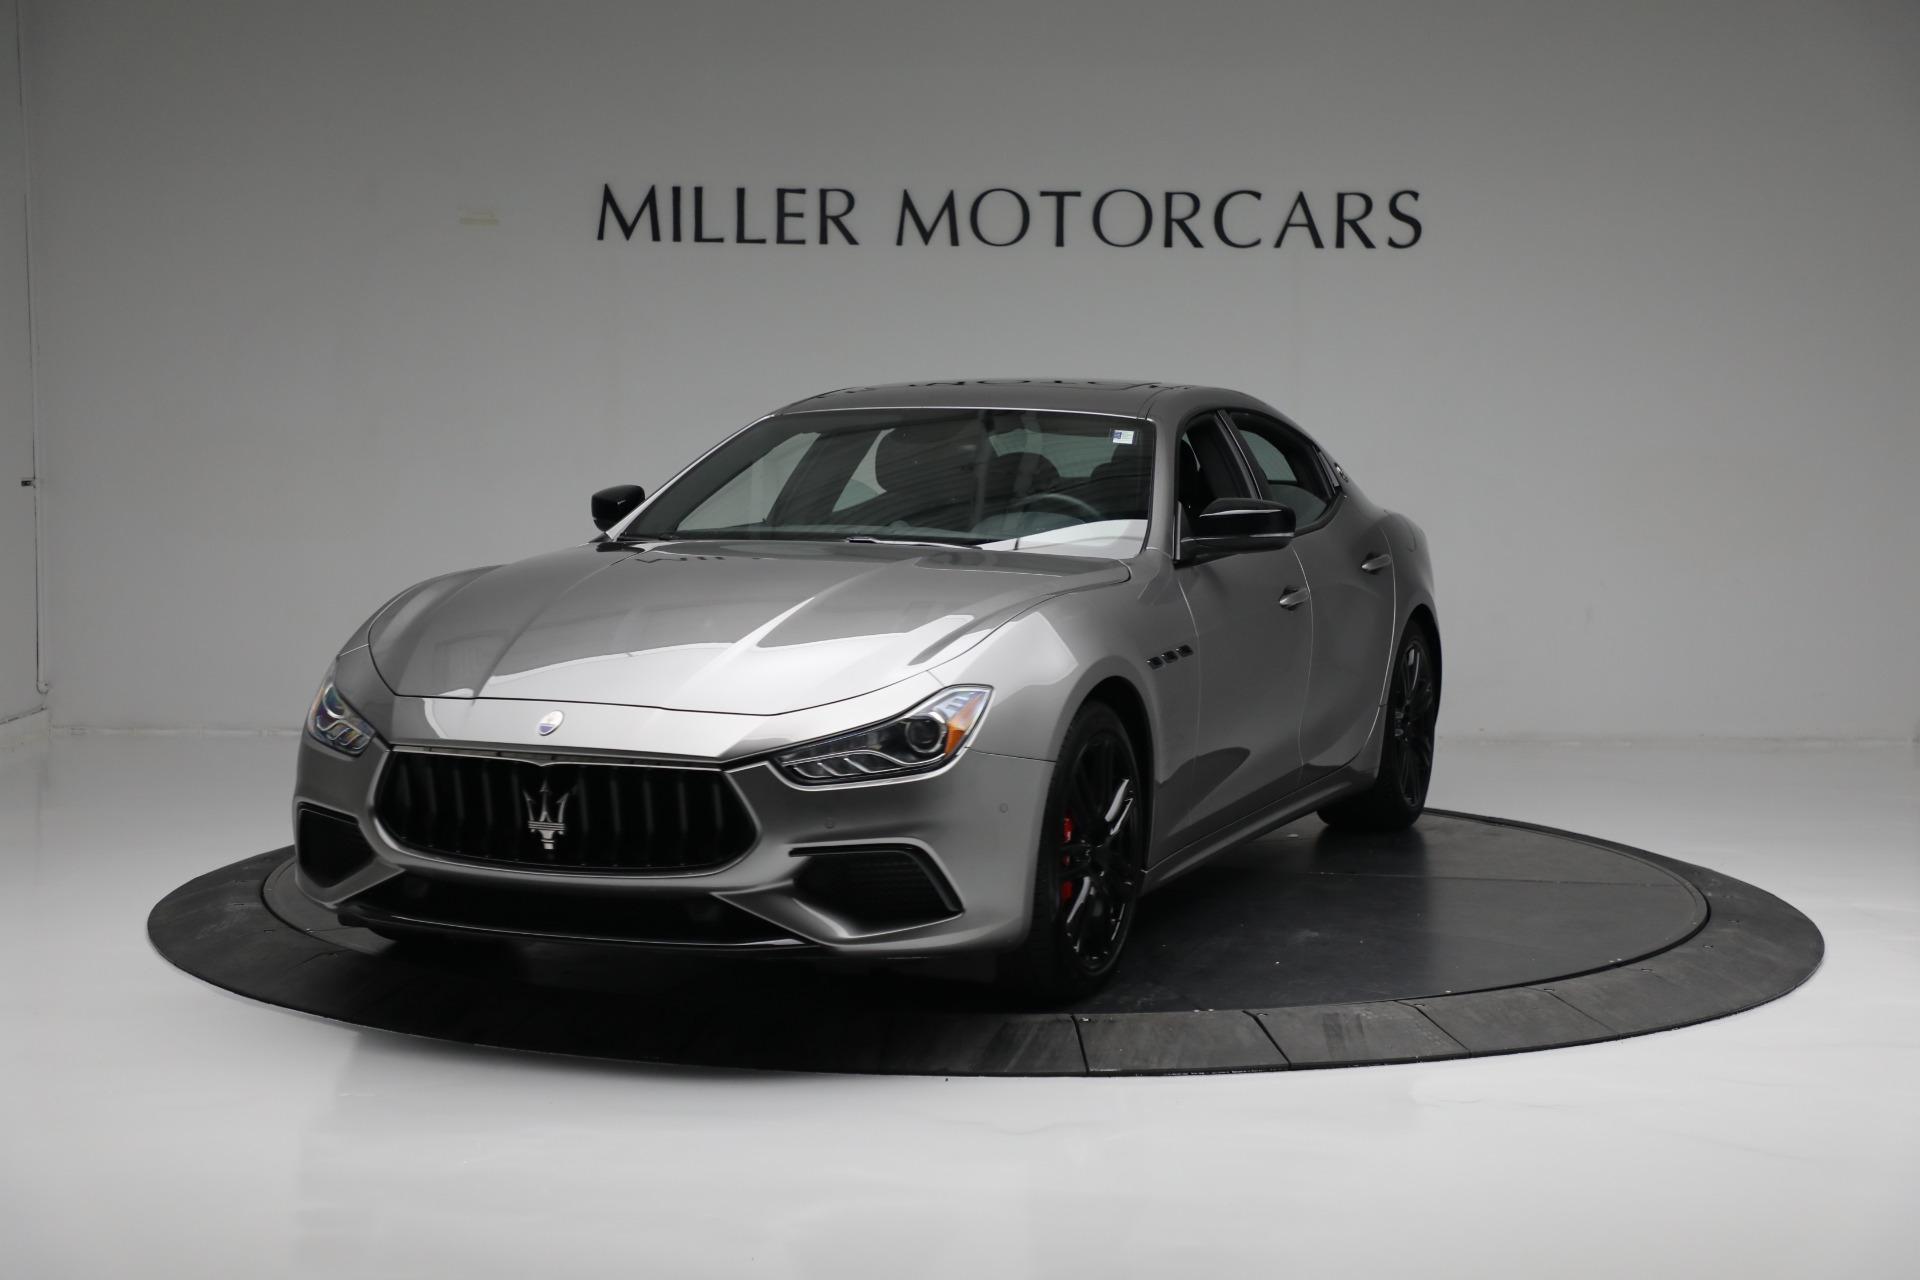 New 2021 Maserati Ghibli S Q4 for sale $90,075 at McLaren Greenwich in Greenwich CT 06830 1